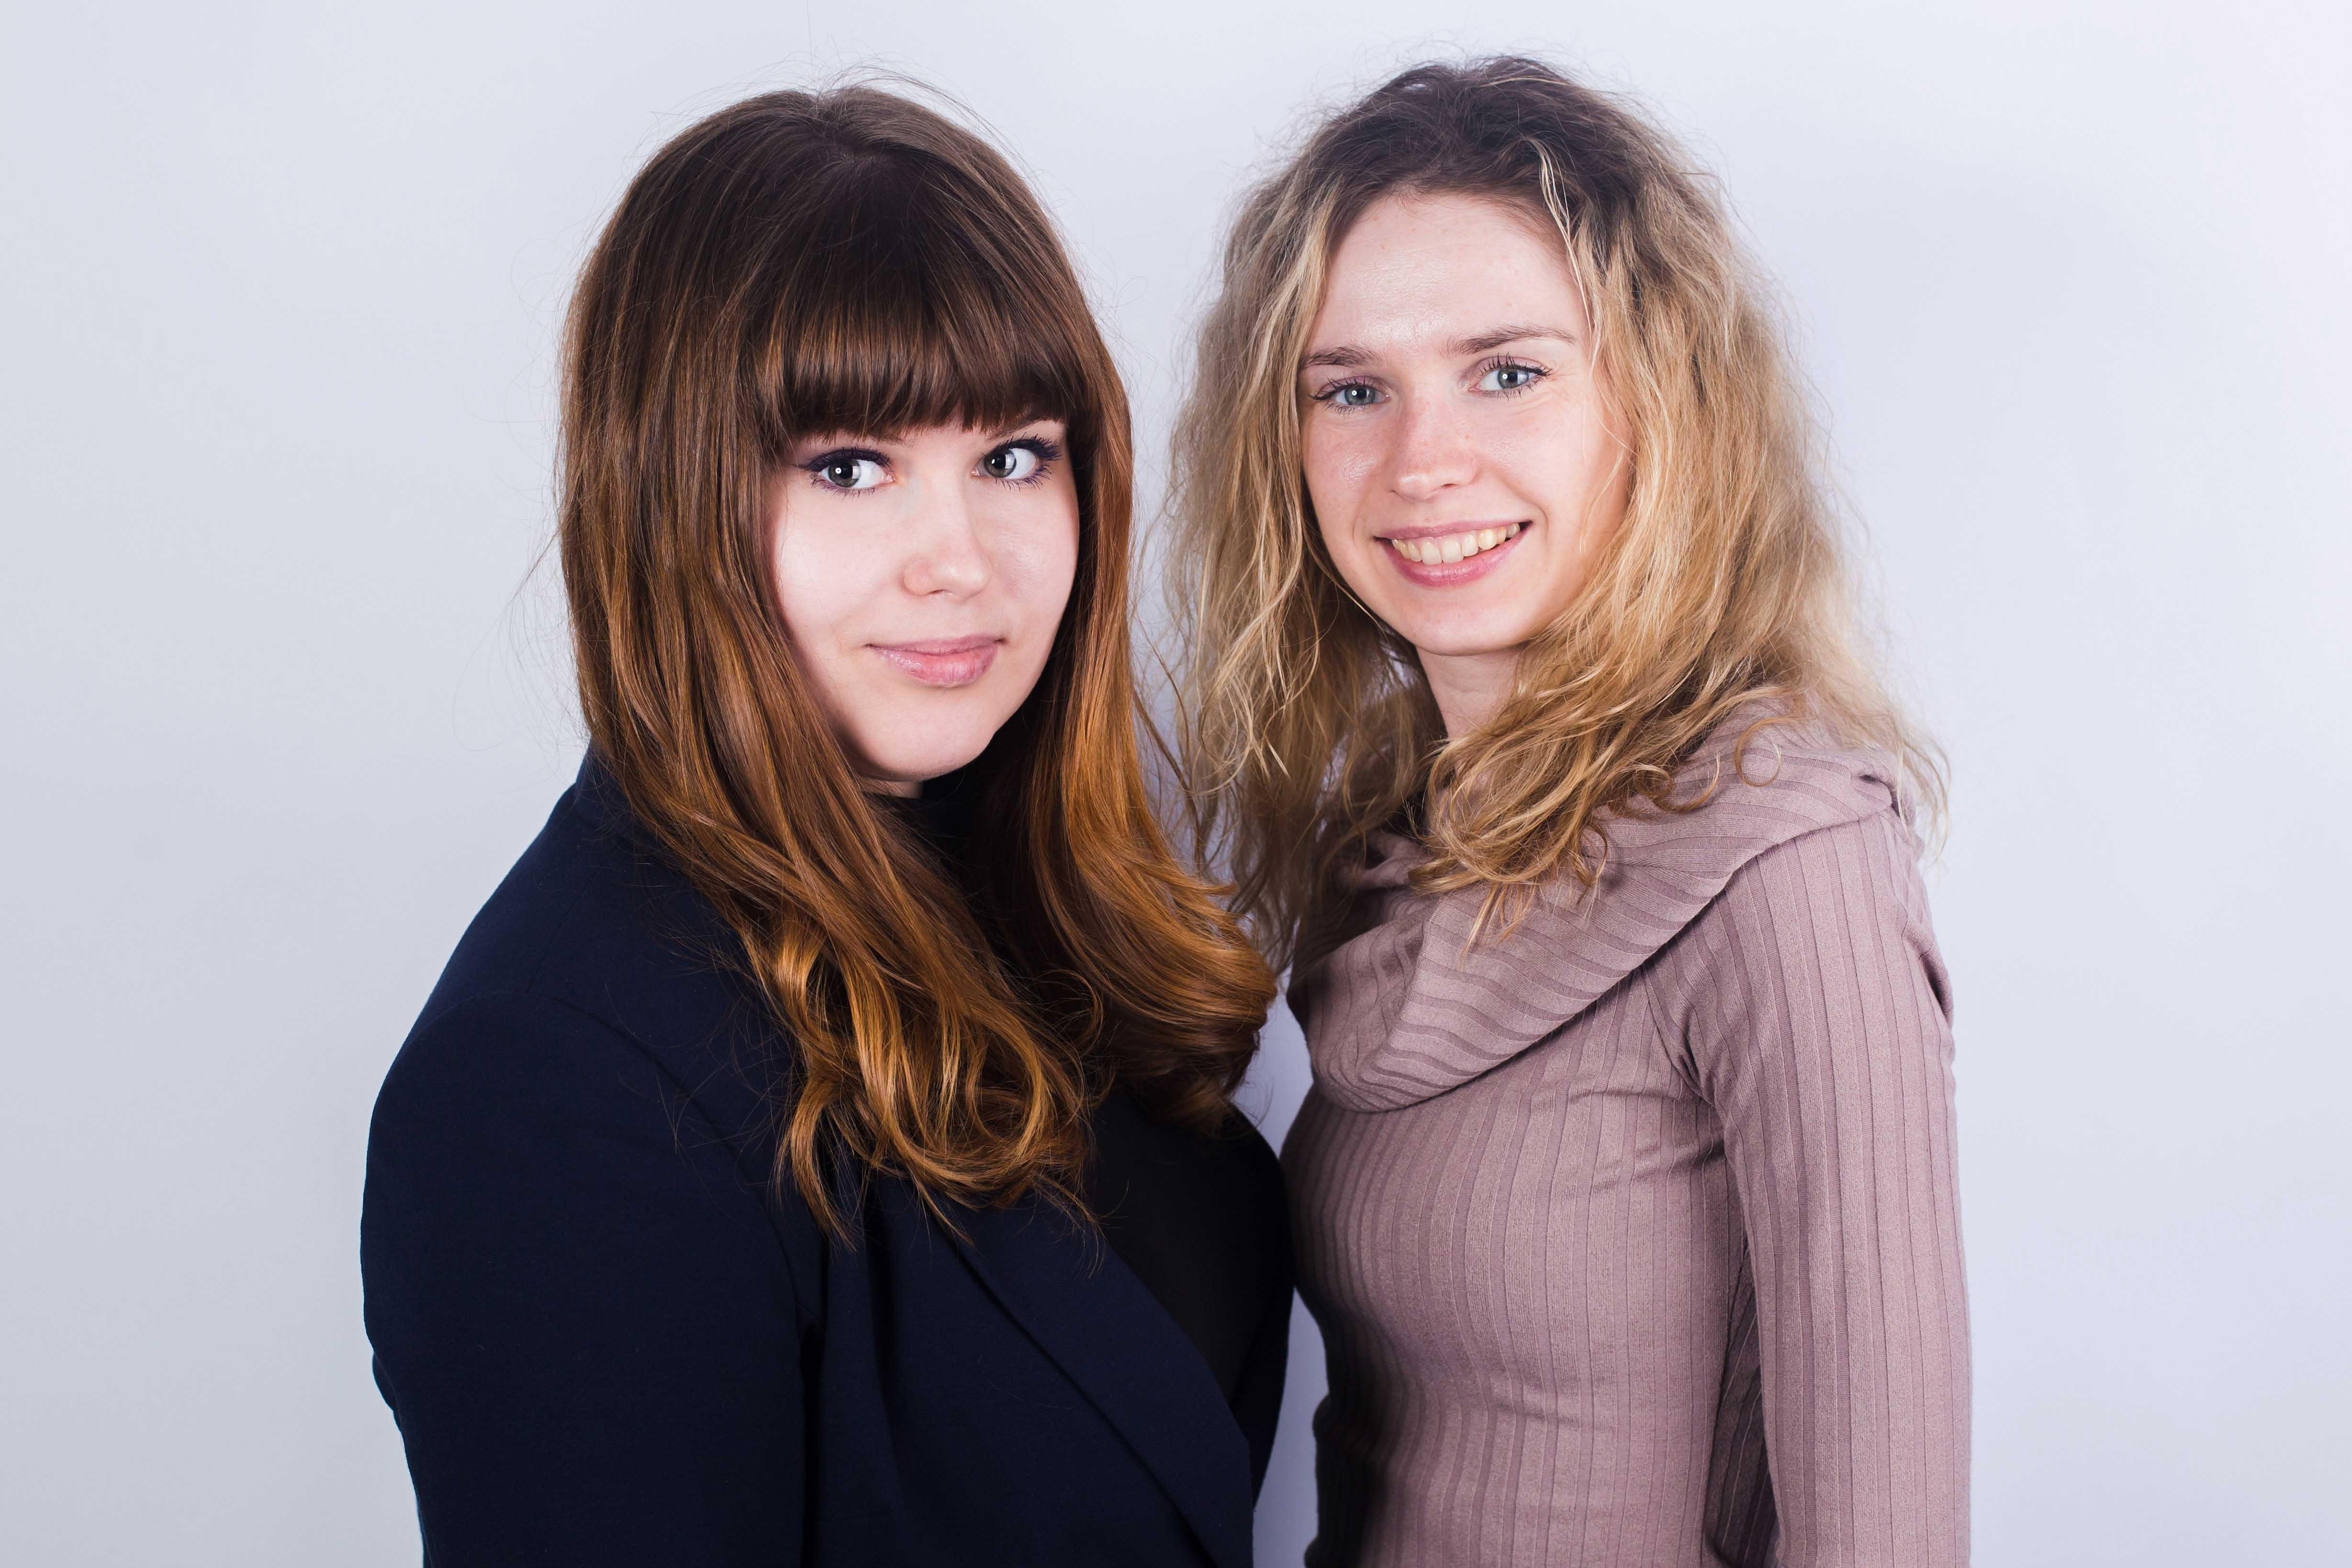 Университет ИТМО. Екатерина Боглаева и Дарья Денисова